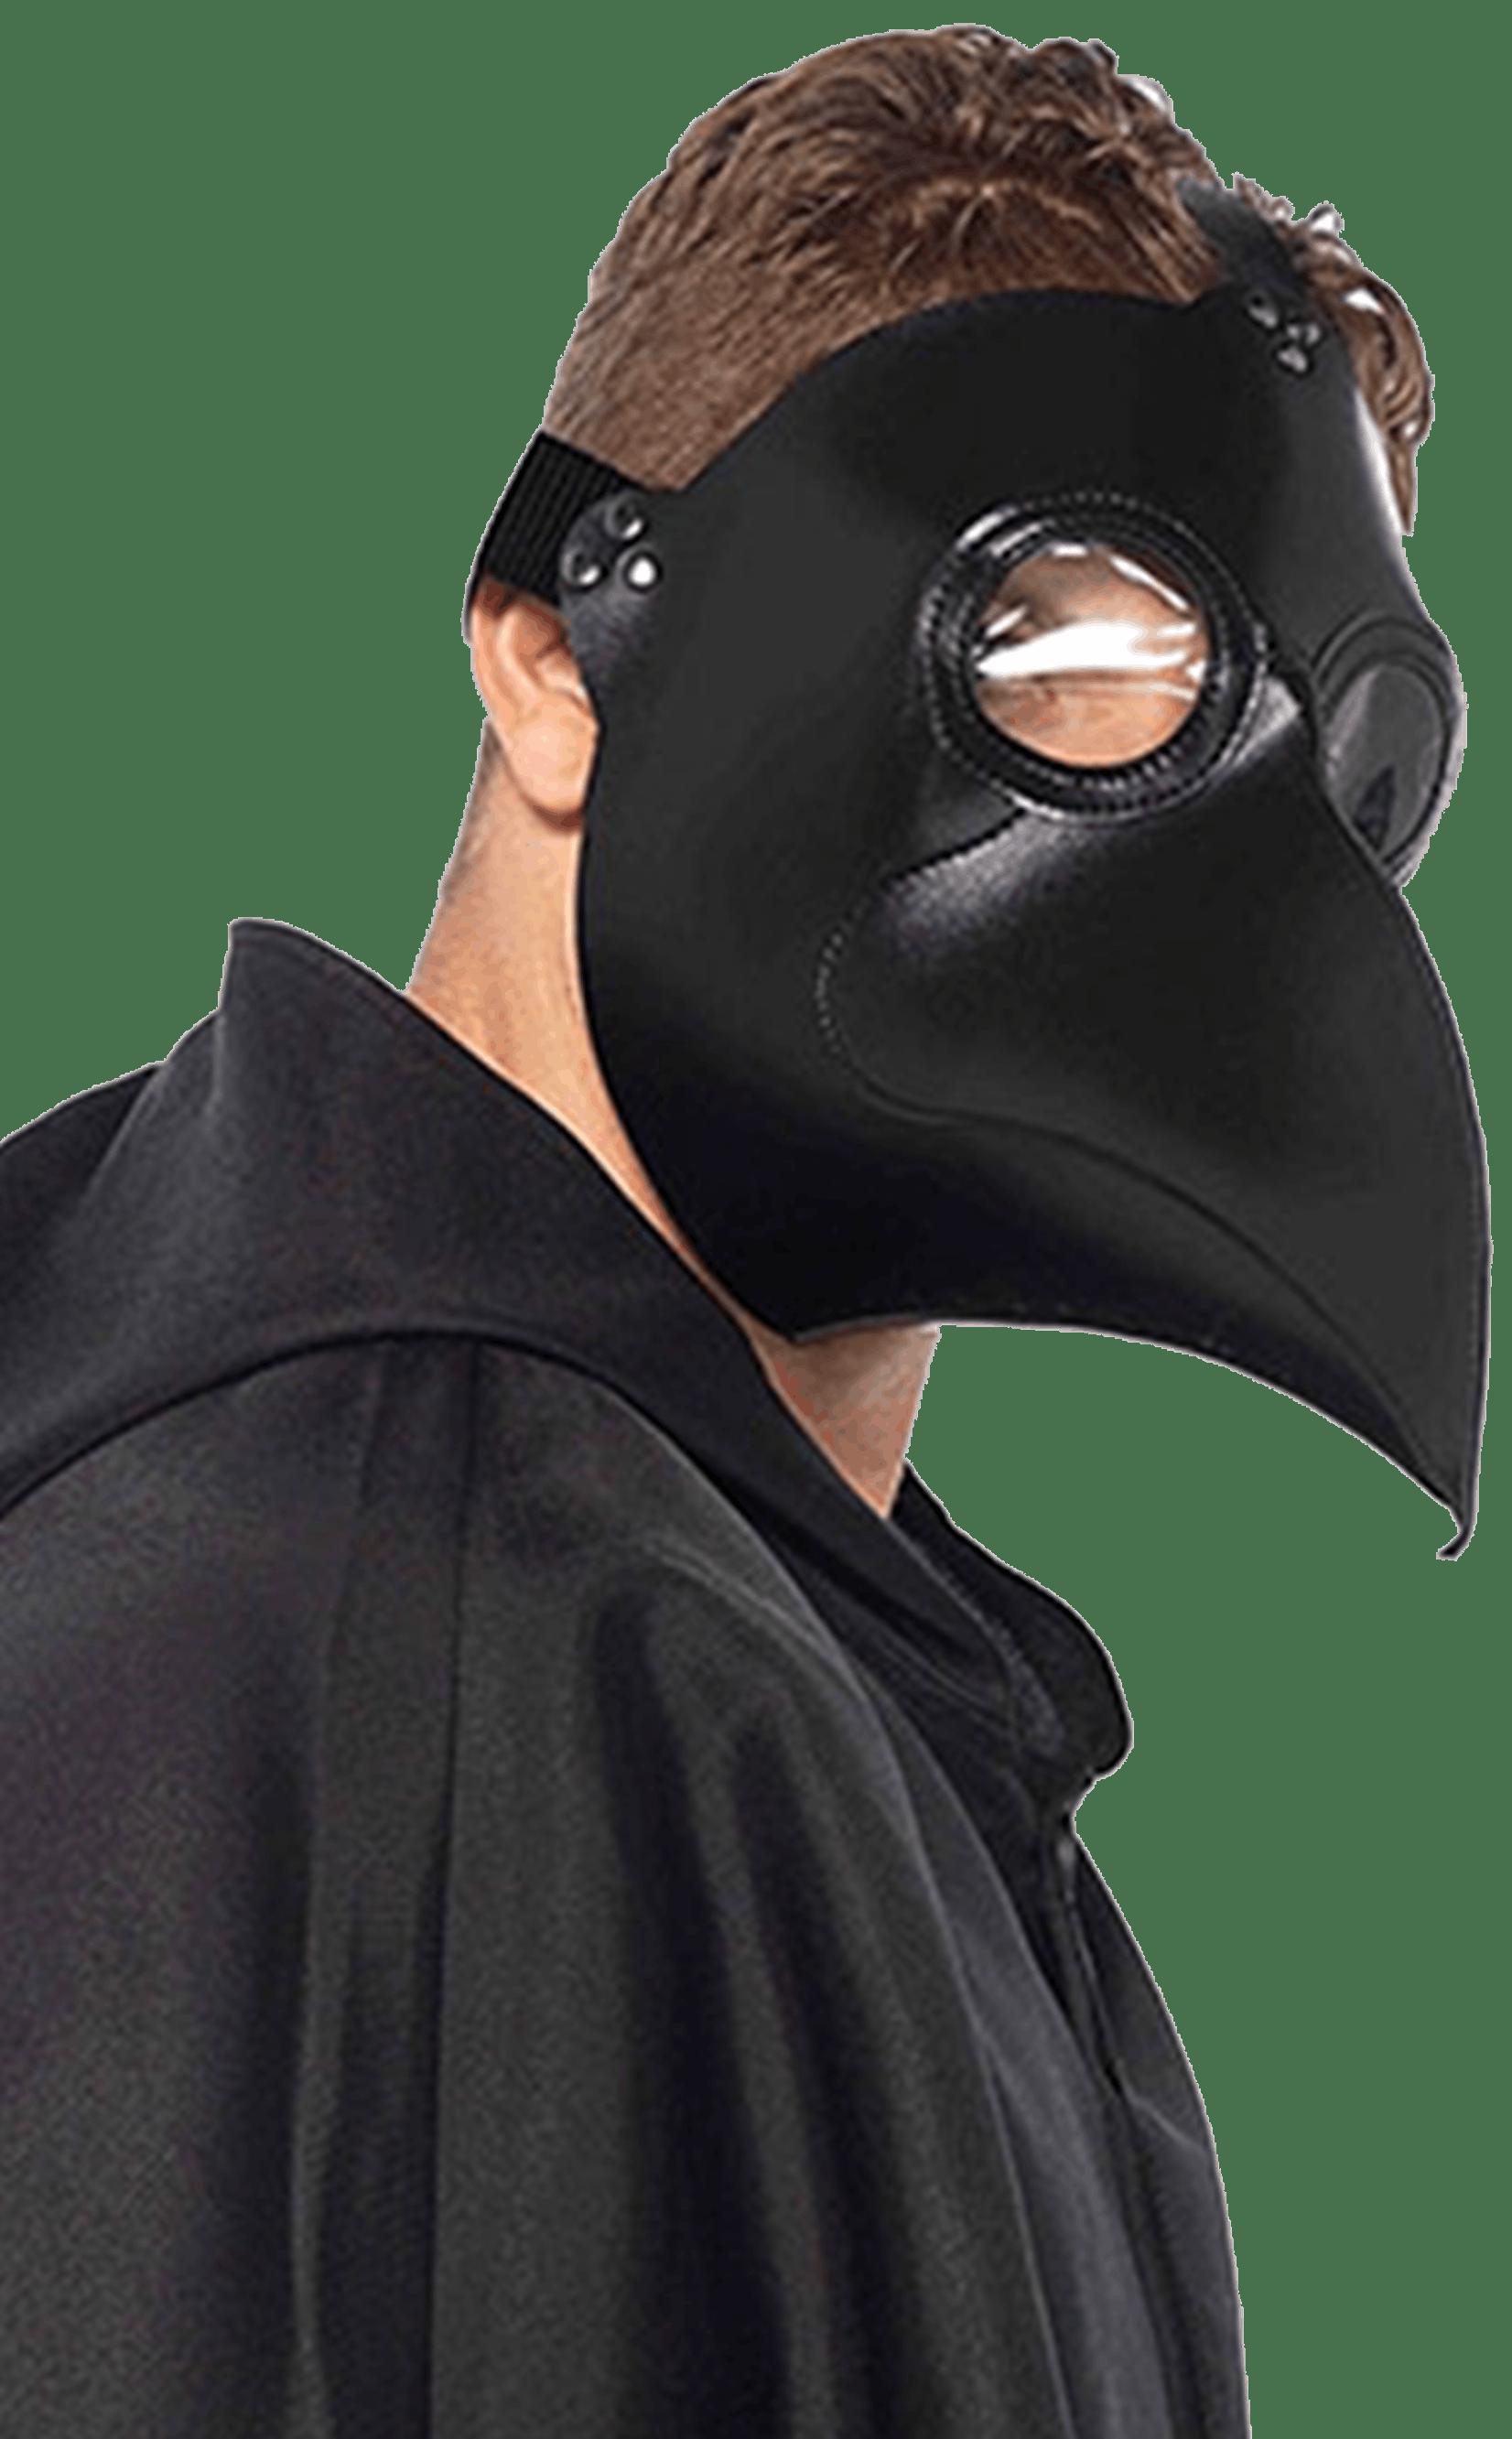 Plague Doctor Facepiece Accessory